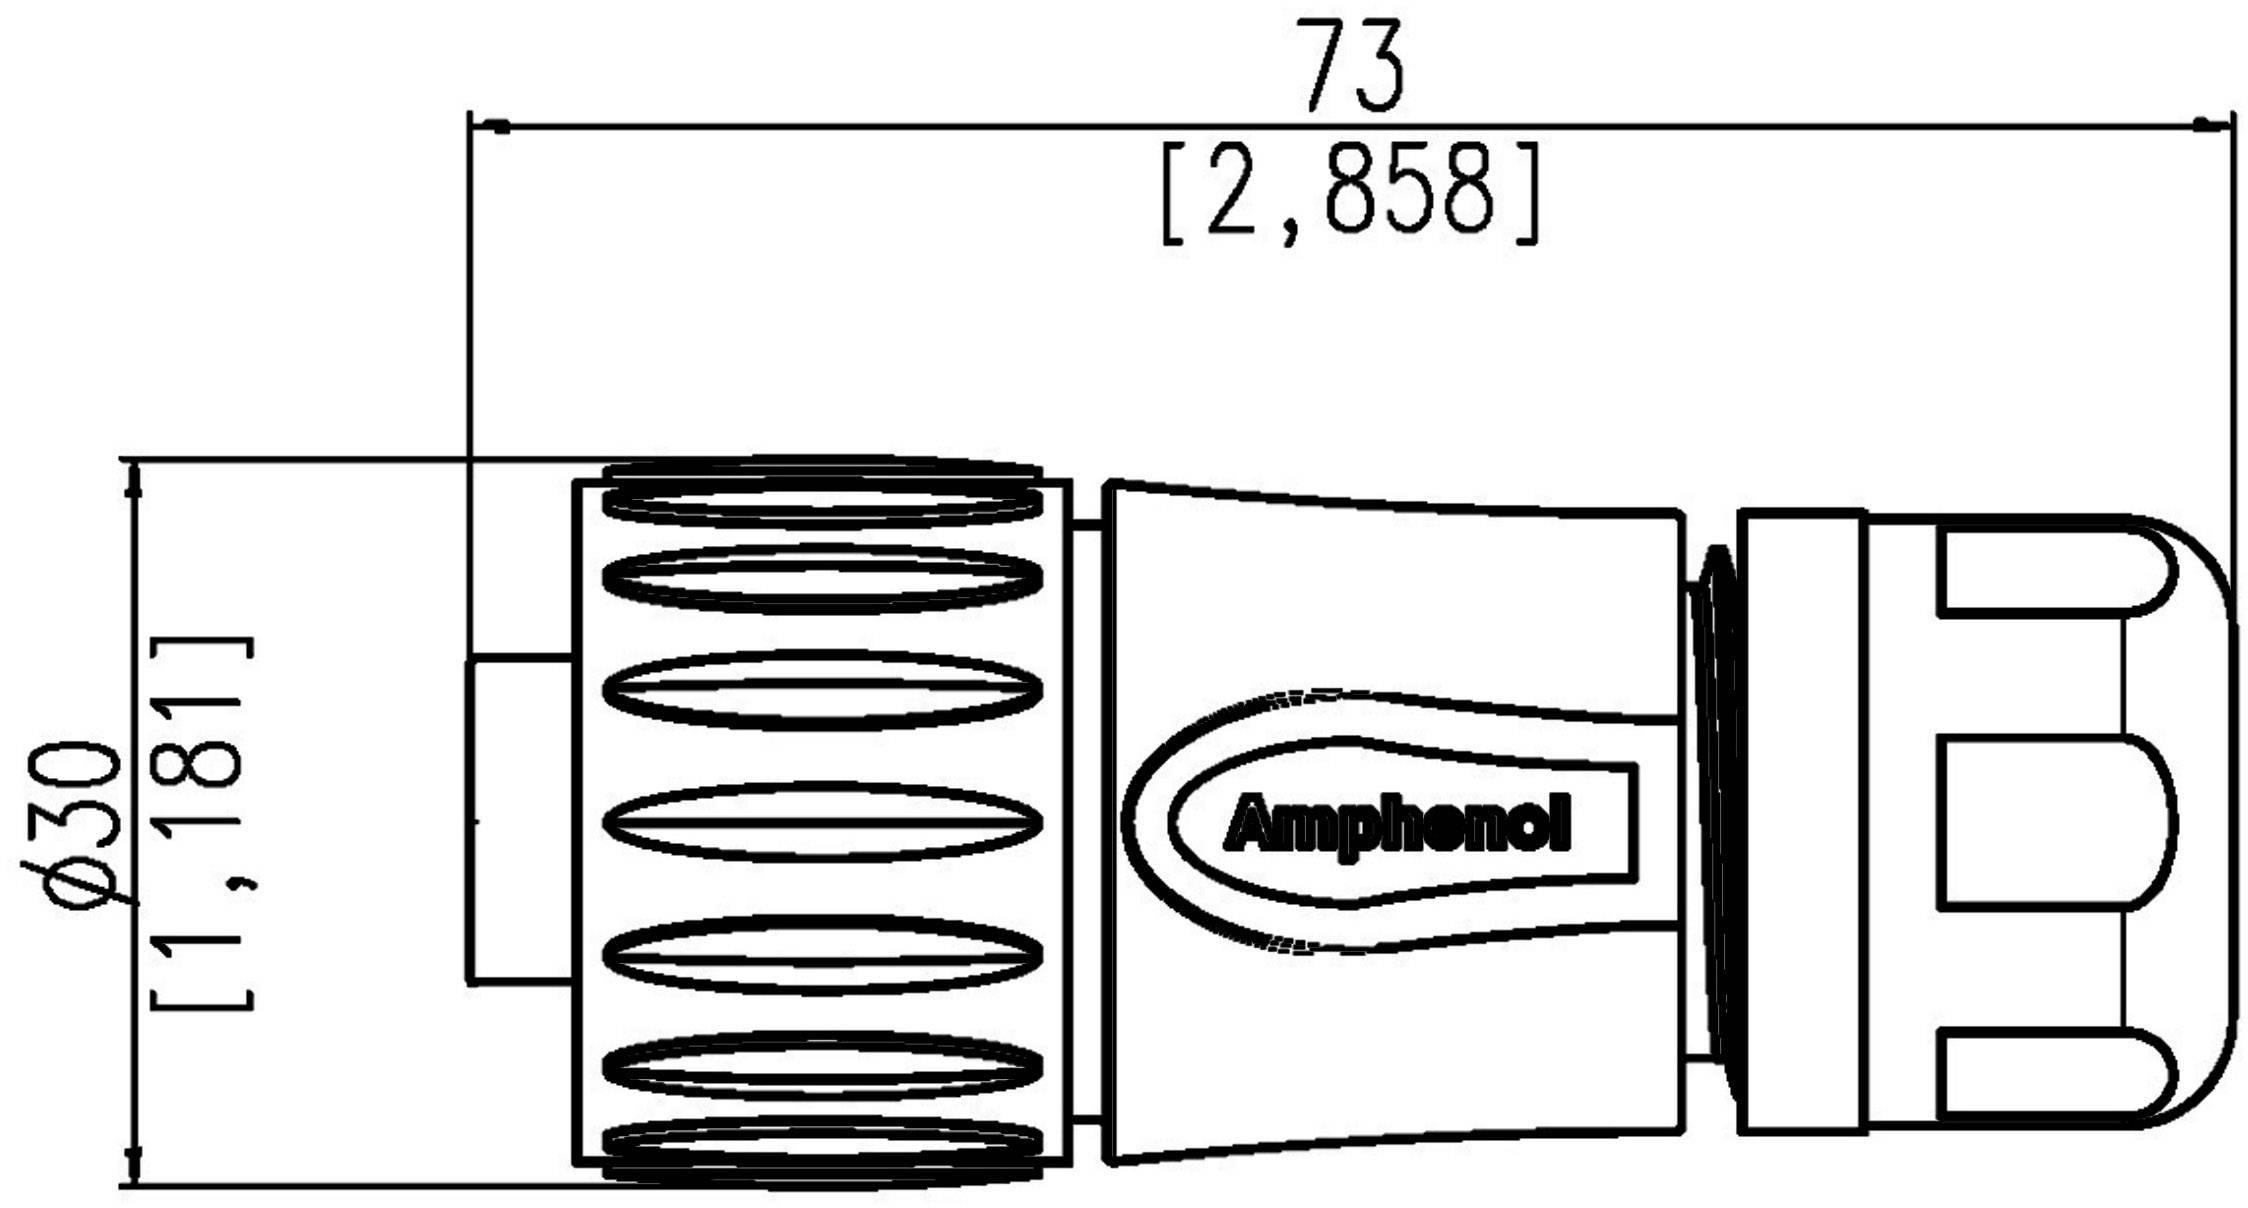 Guľatý faston Amphenol C016 10H006 010 12 IP67 (v zablokovanom stave), polyamid 6.6, pólů 6 + PE, 1 ks